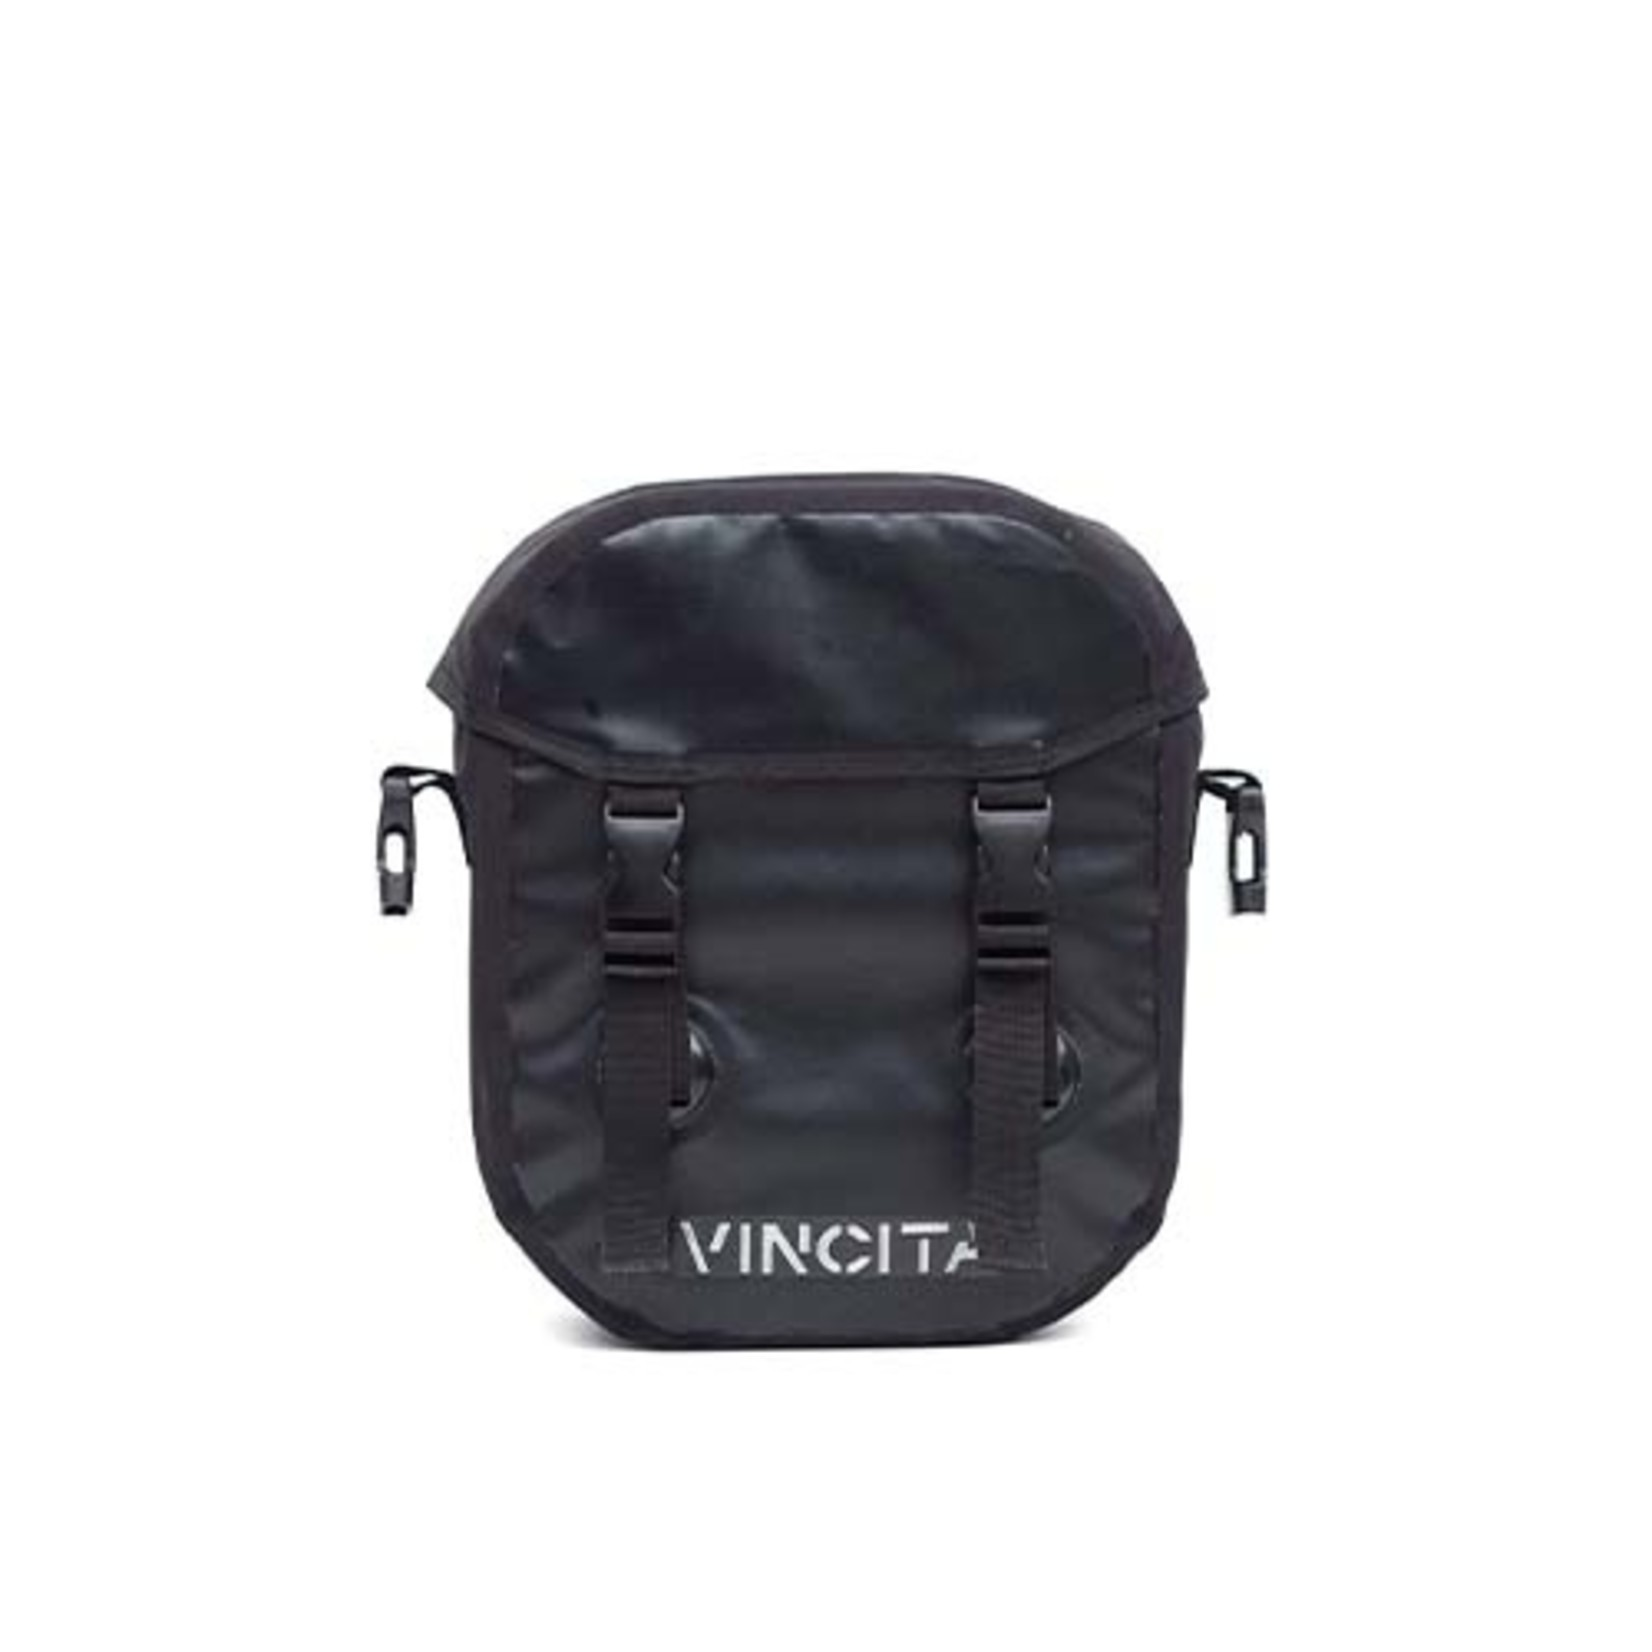 VINCITA SINGLE PANNIER BAG (PAIR)